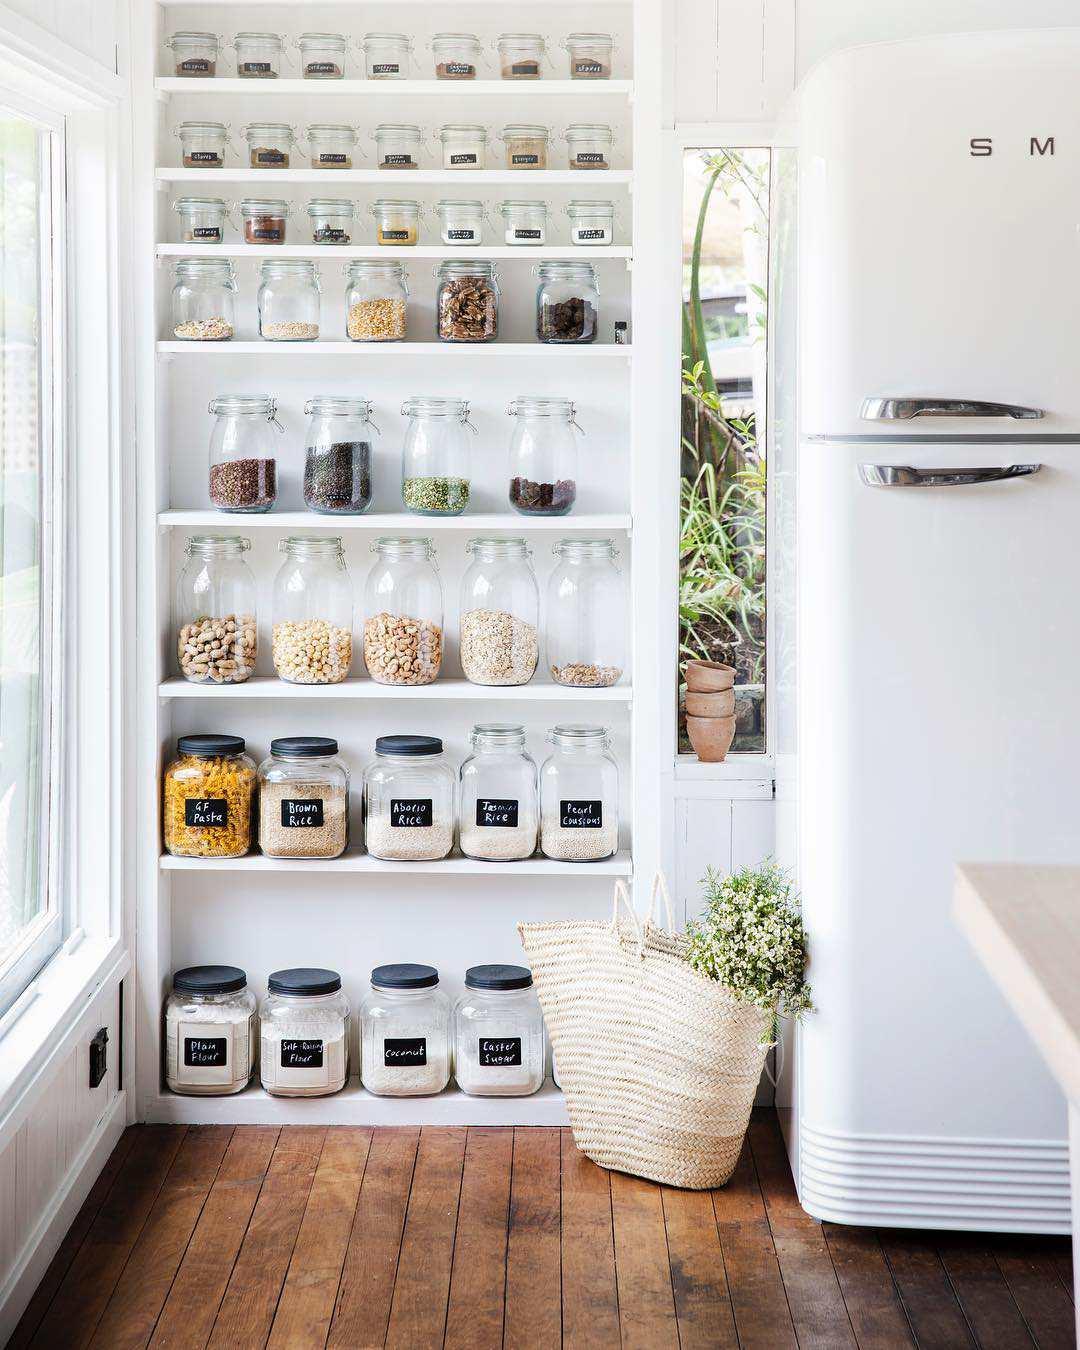 Importance of kitchen shelf